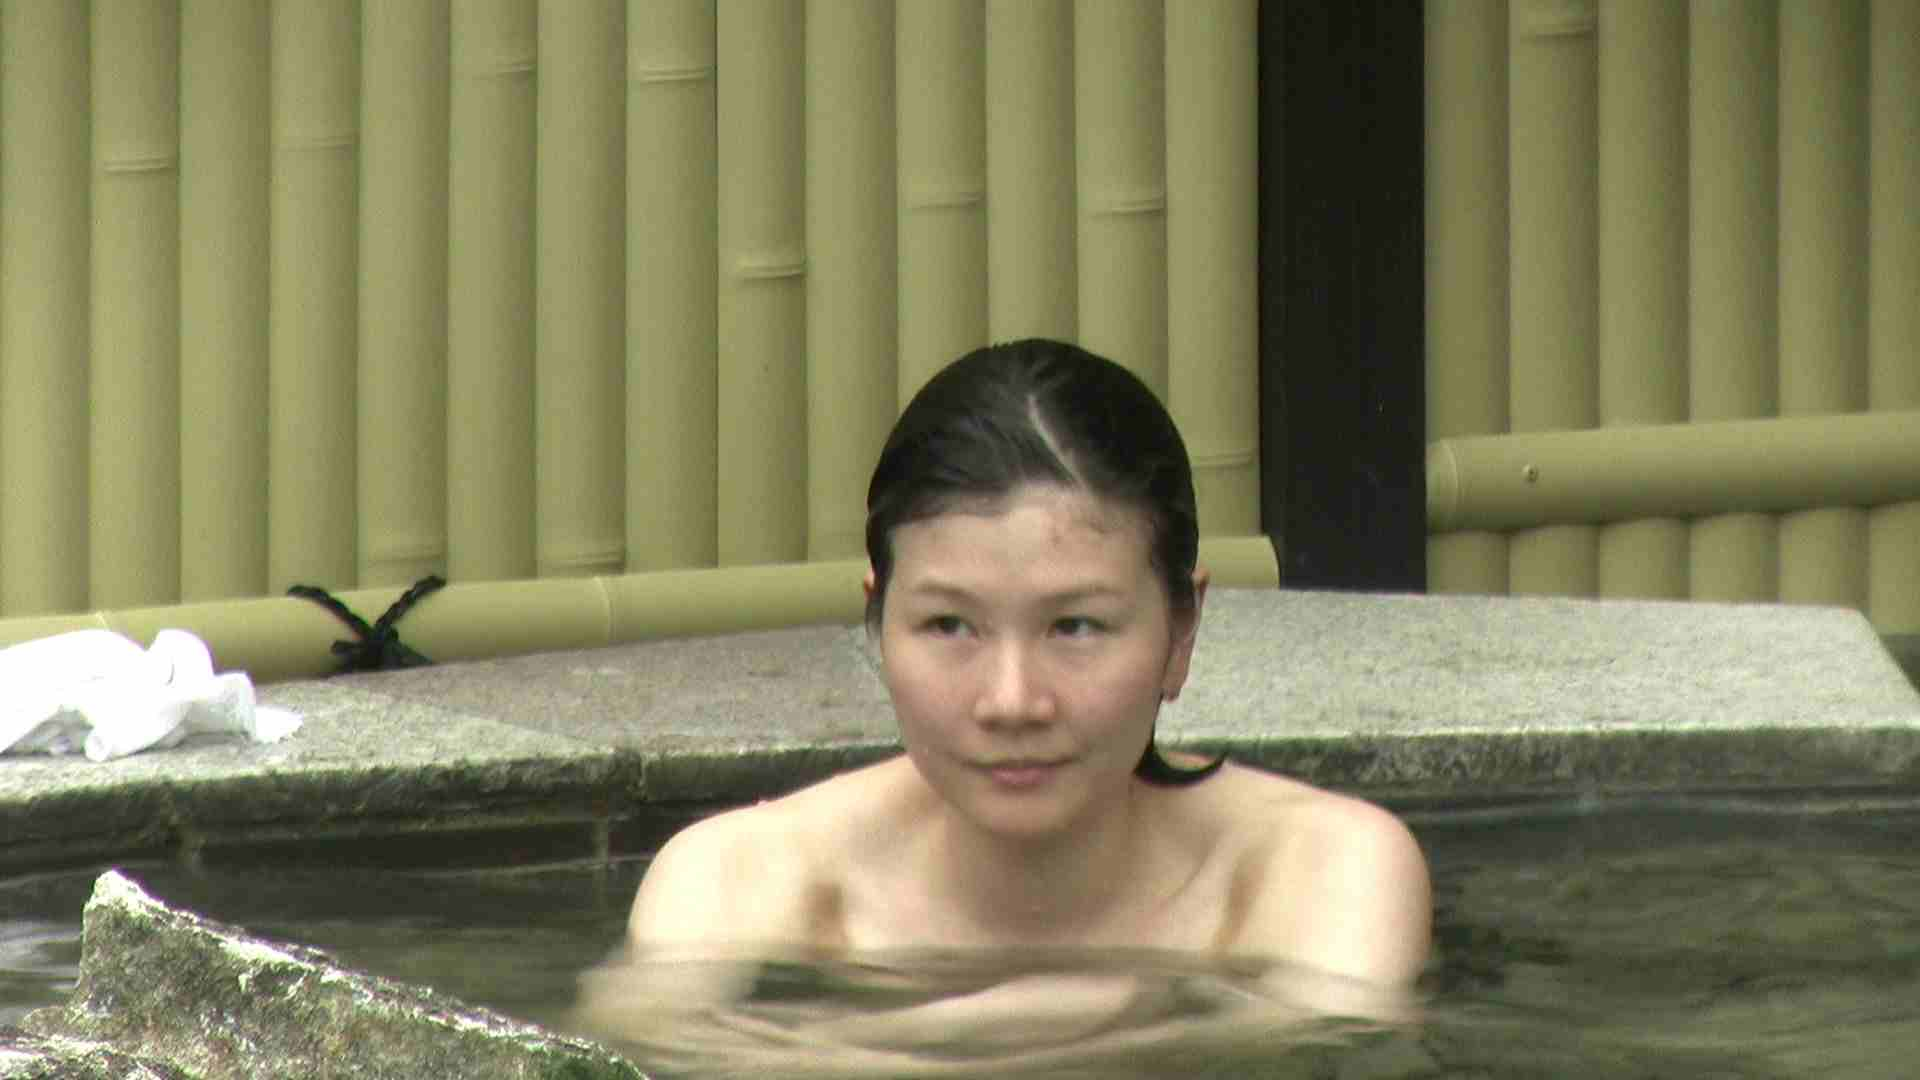 Aquaな露天風呂Vol.187 盗撮  63連発 12